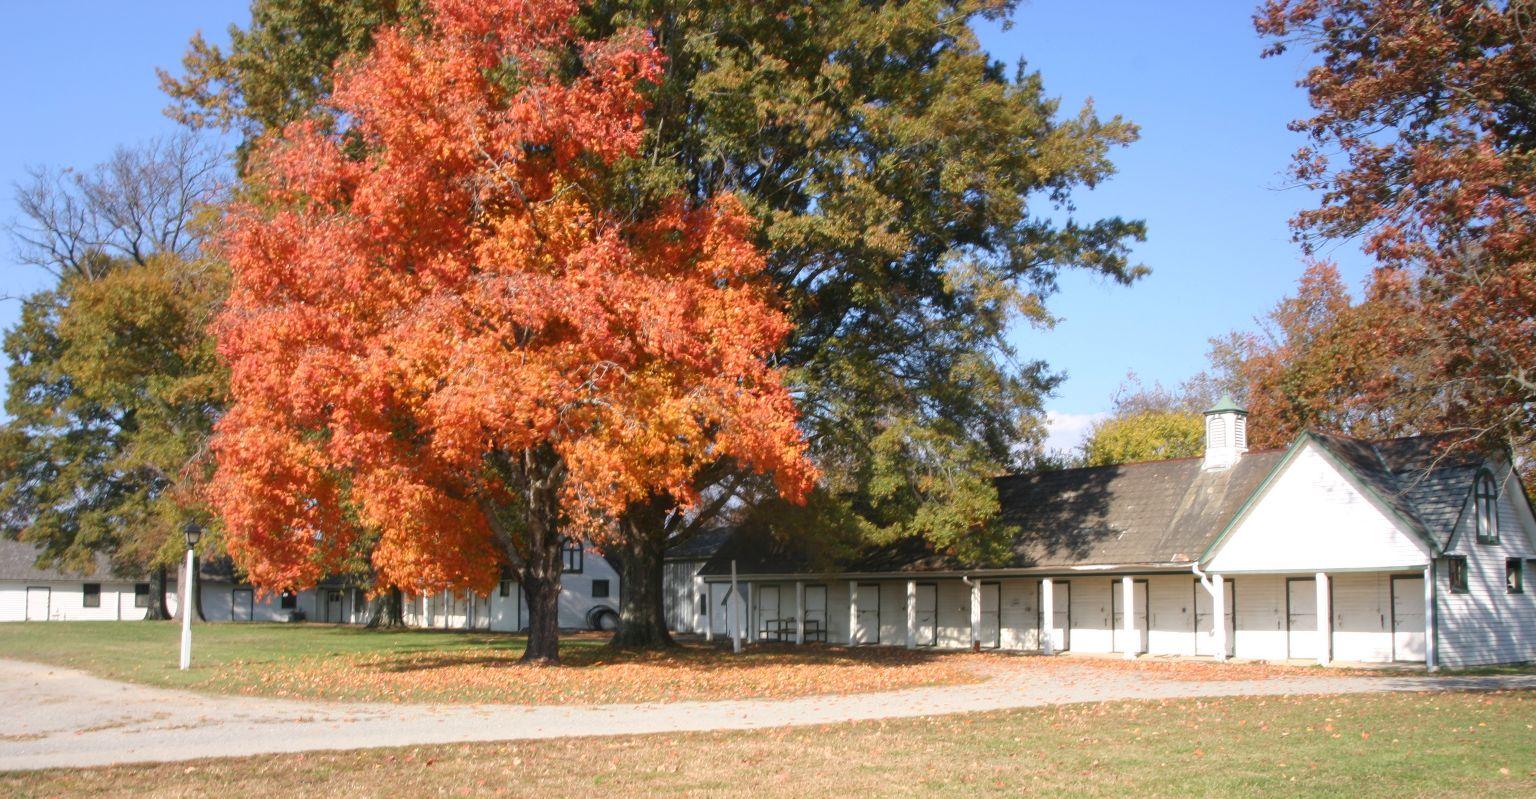 The Meadow Event Park   Fairgrounds   Doswell, VA   richmond.com